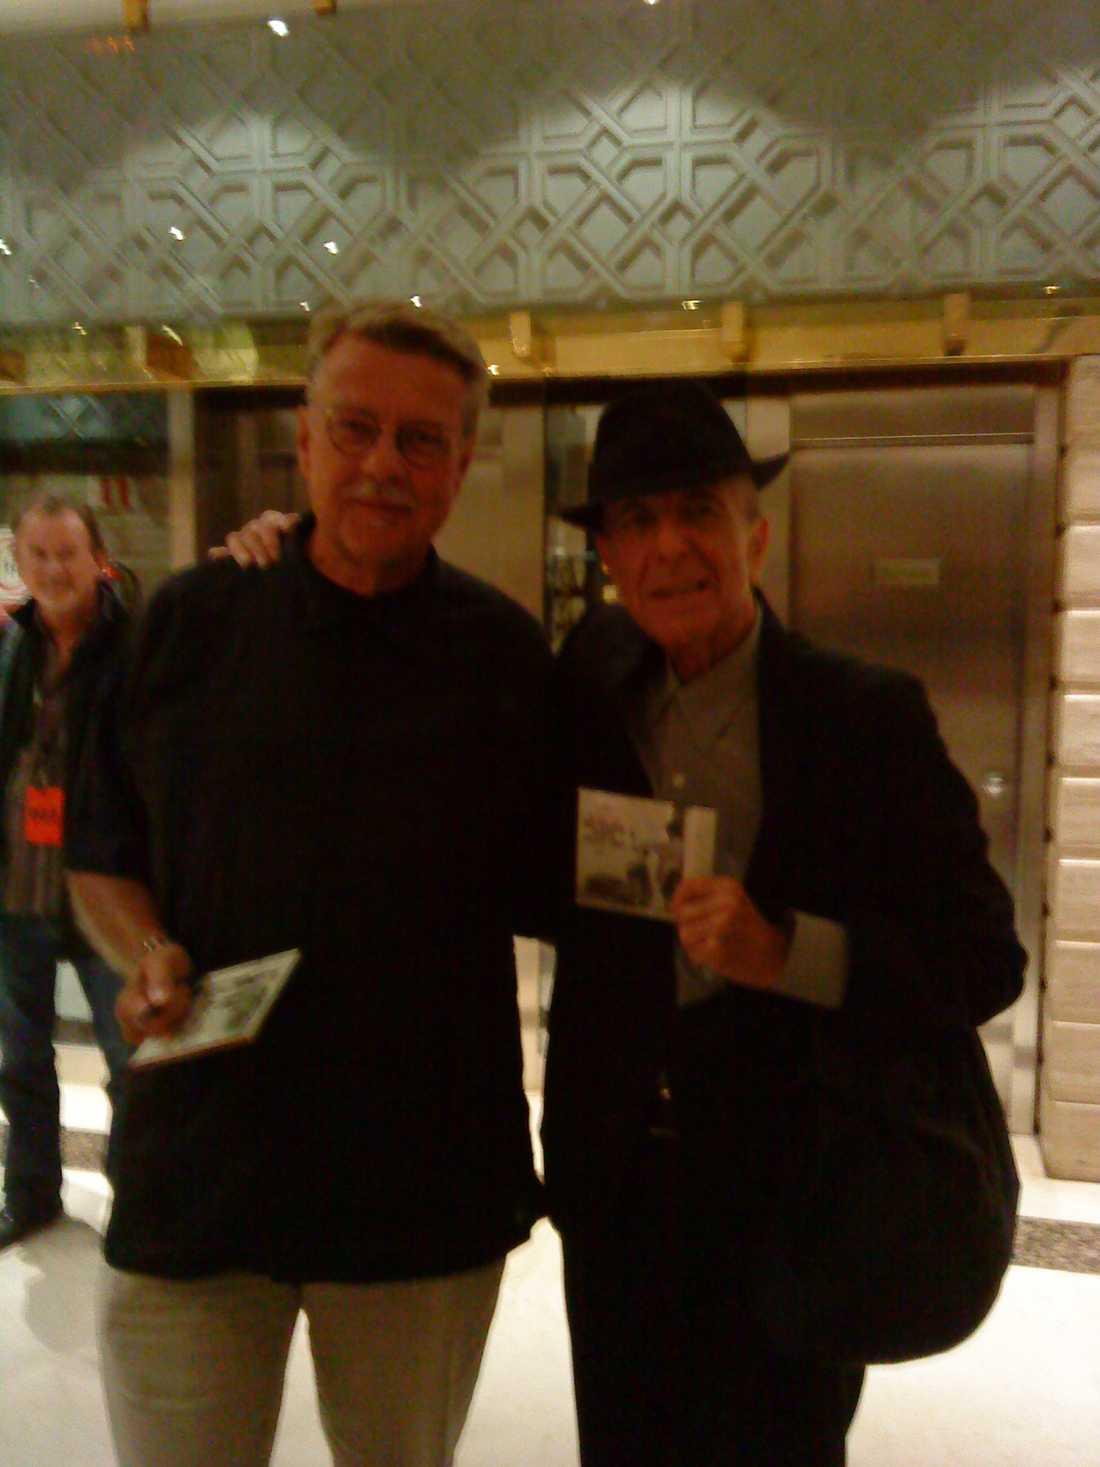 Mikael Wiehe med Leonard Cohen på ett hotell i Granada, 2009. Foto: Maya Wiehe